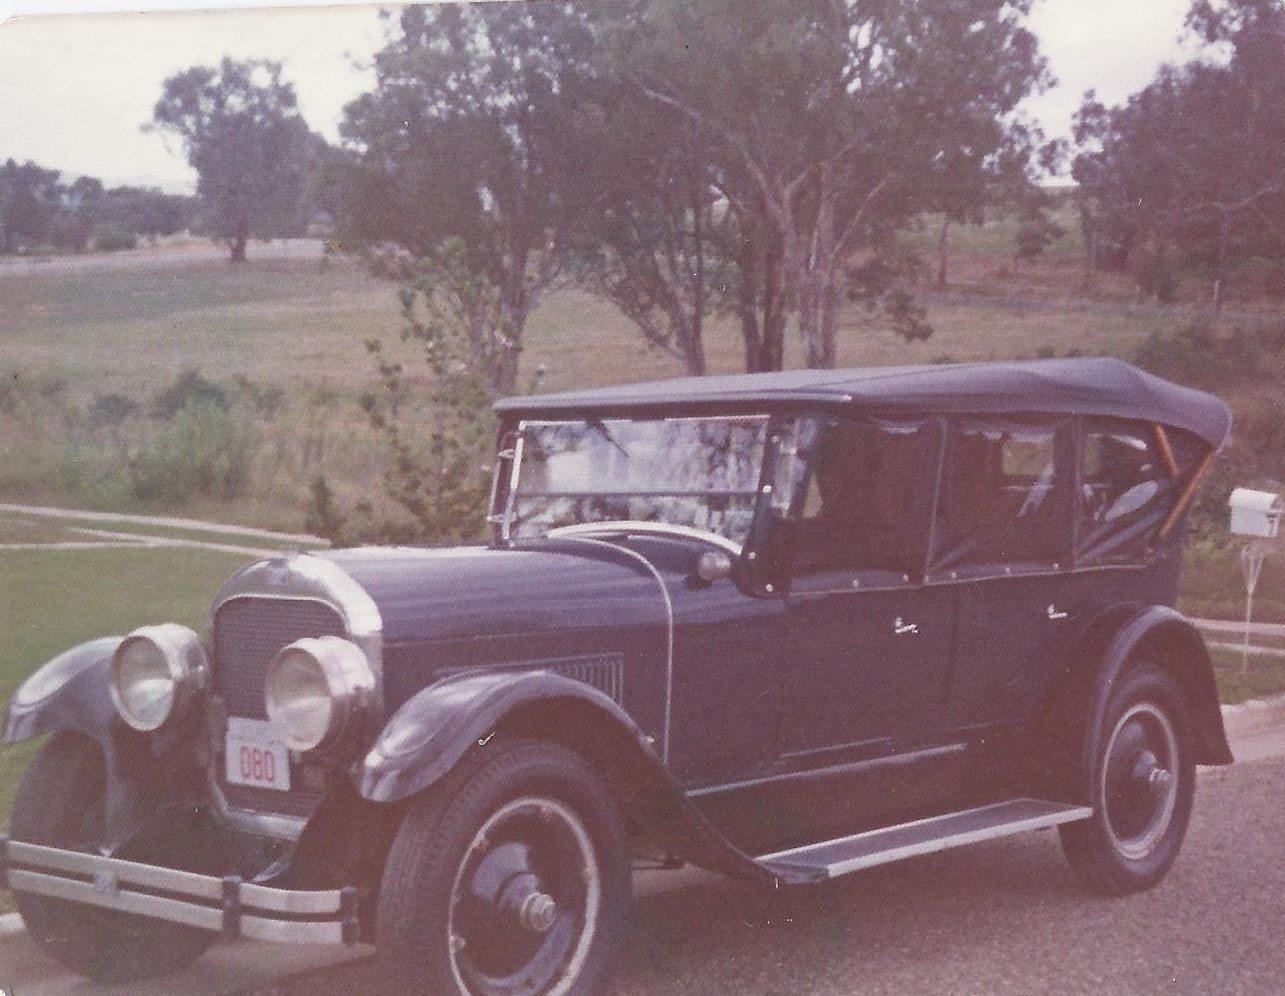 chris-nicholes-1974pic-1925flintcar